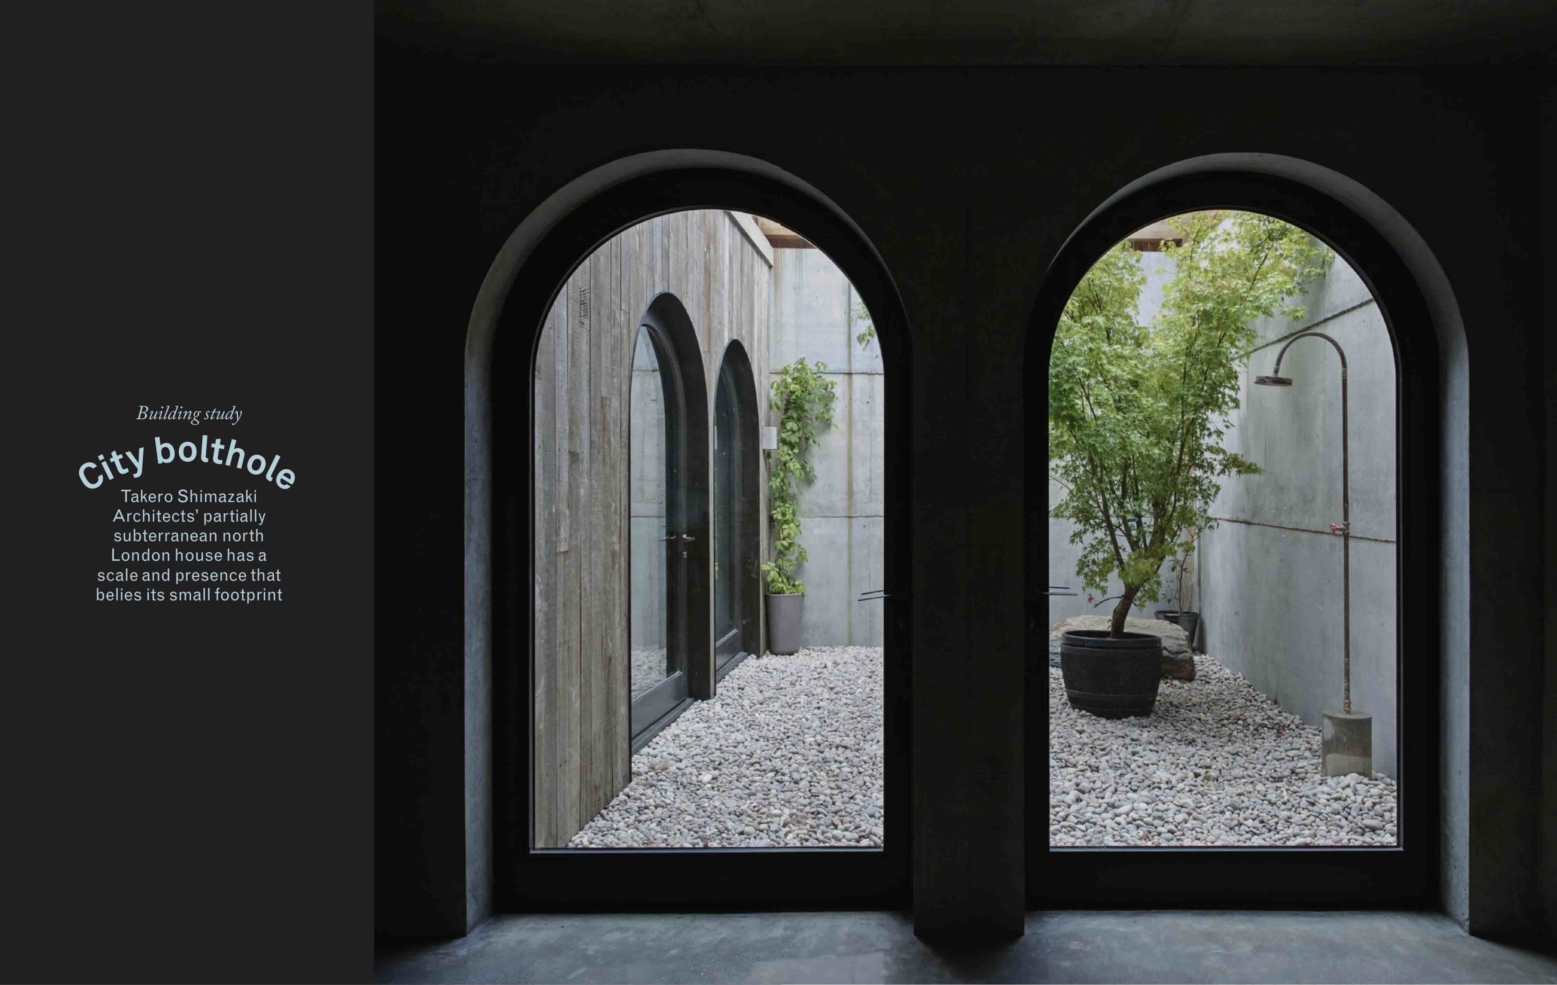 t-sa_Tiverton_Architects Journal_01